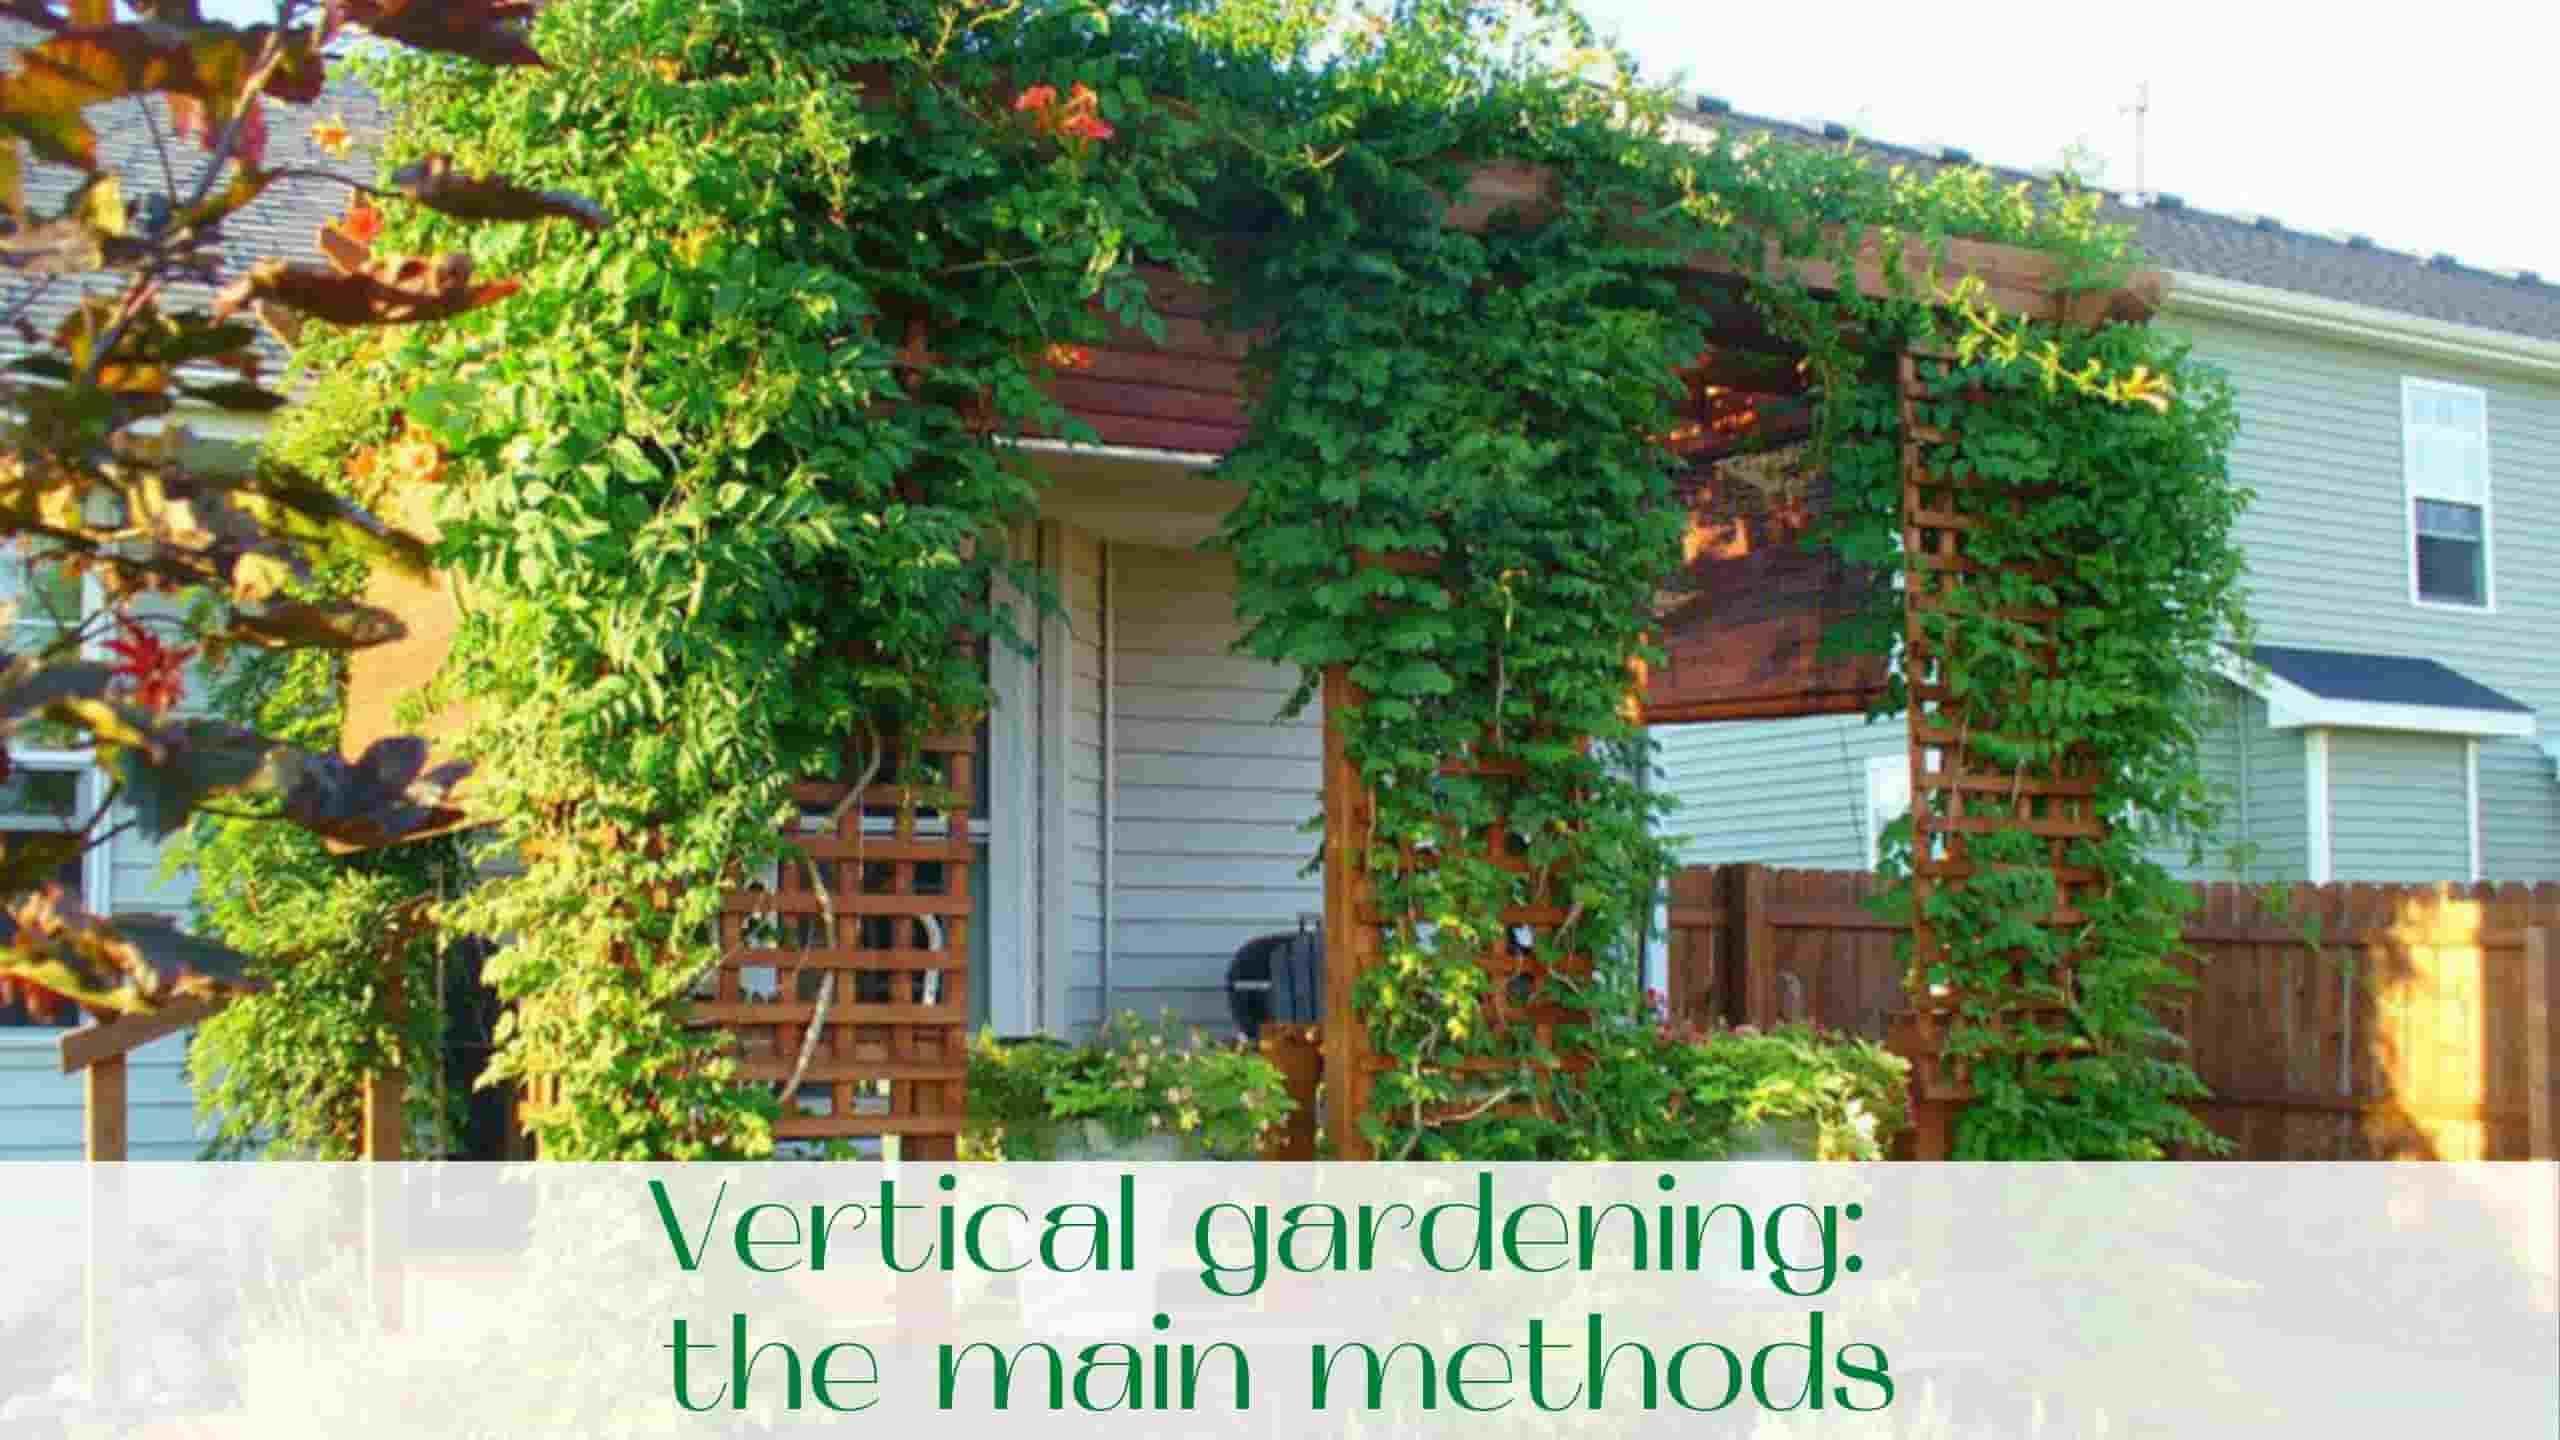 image-Vertical-gardening-the-main-methods